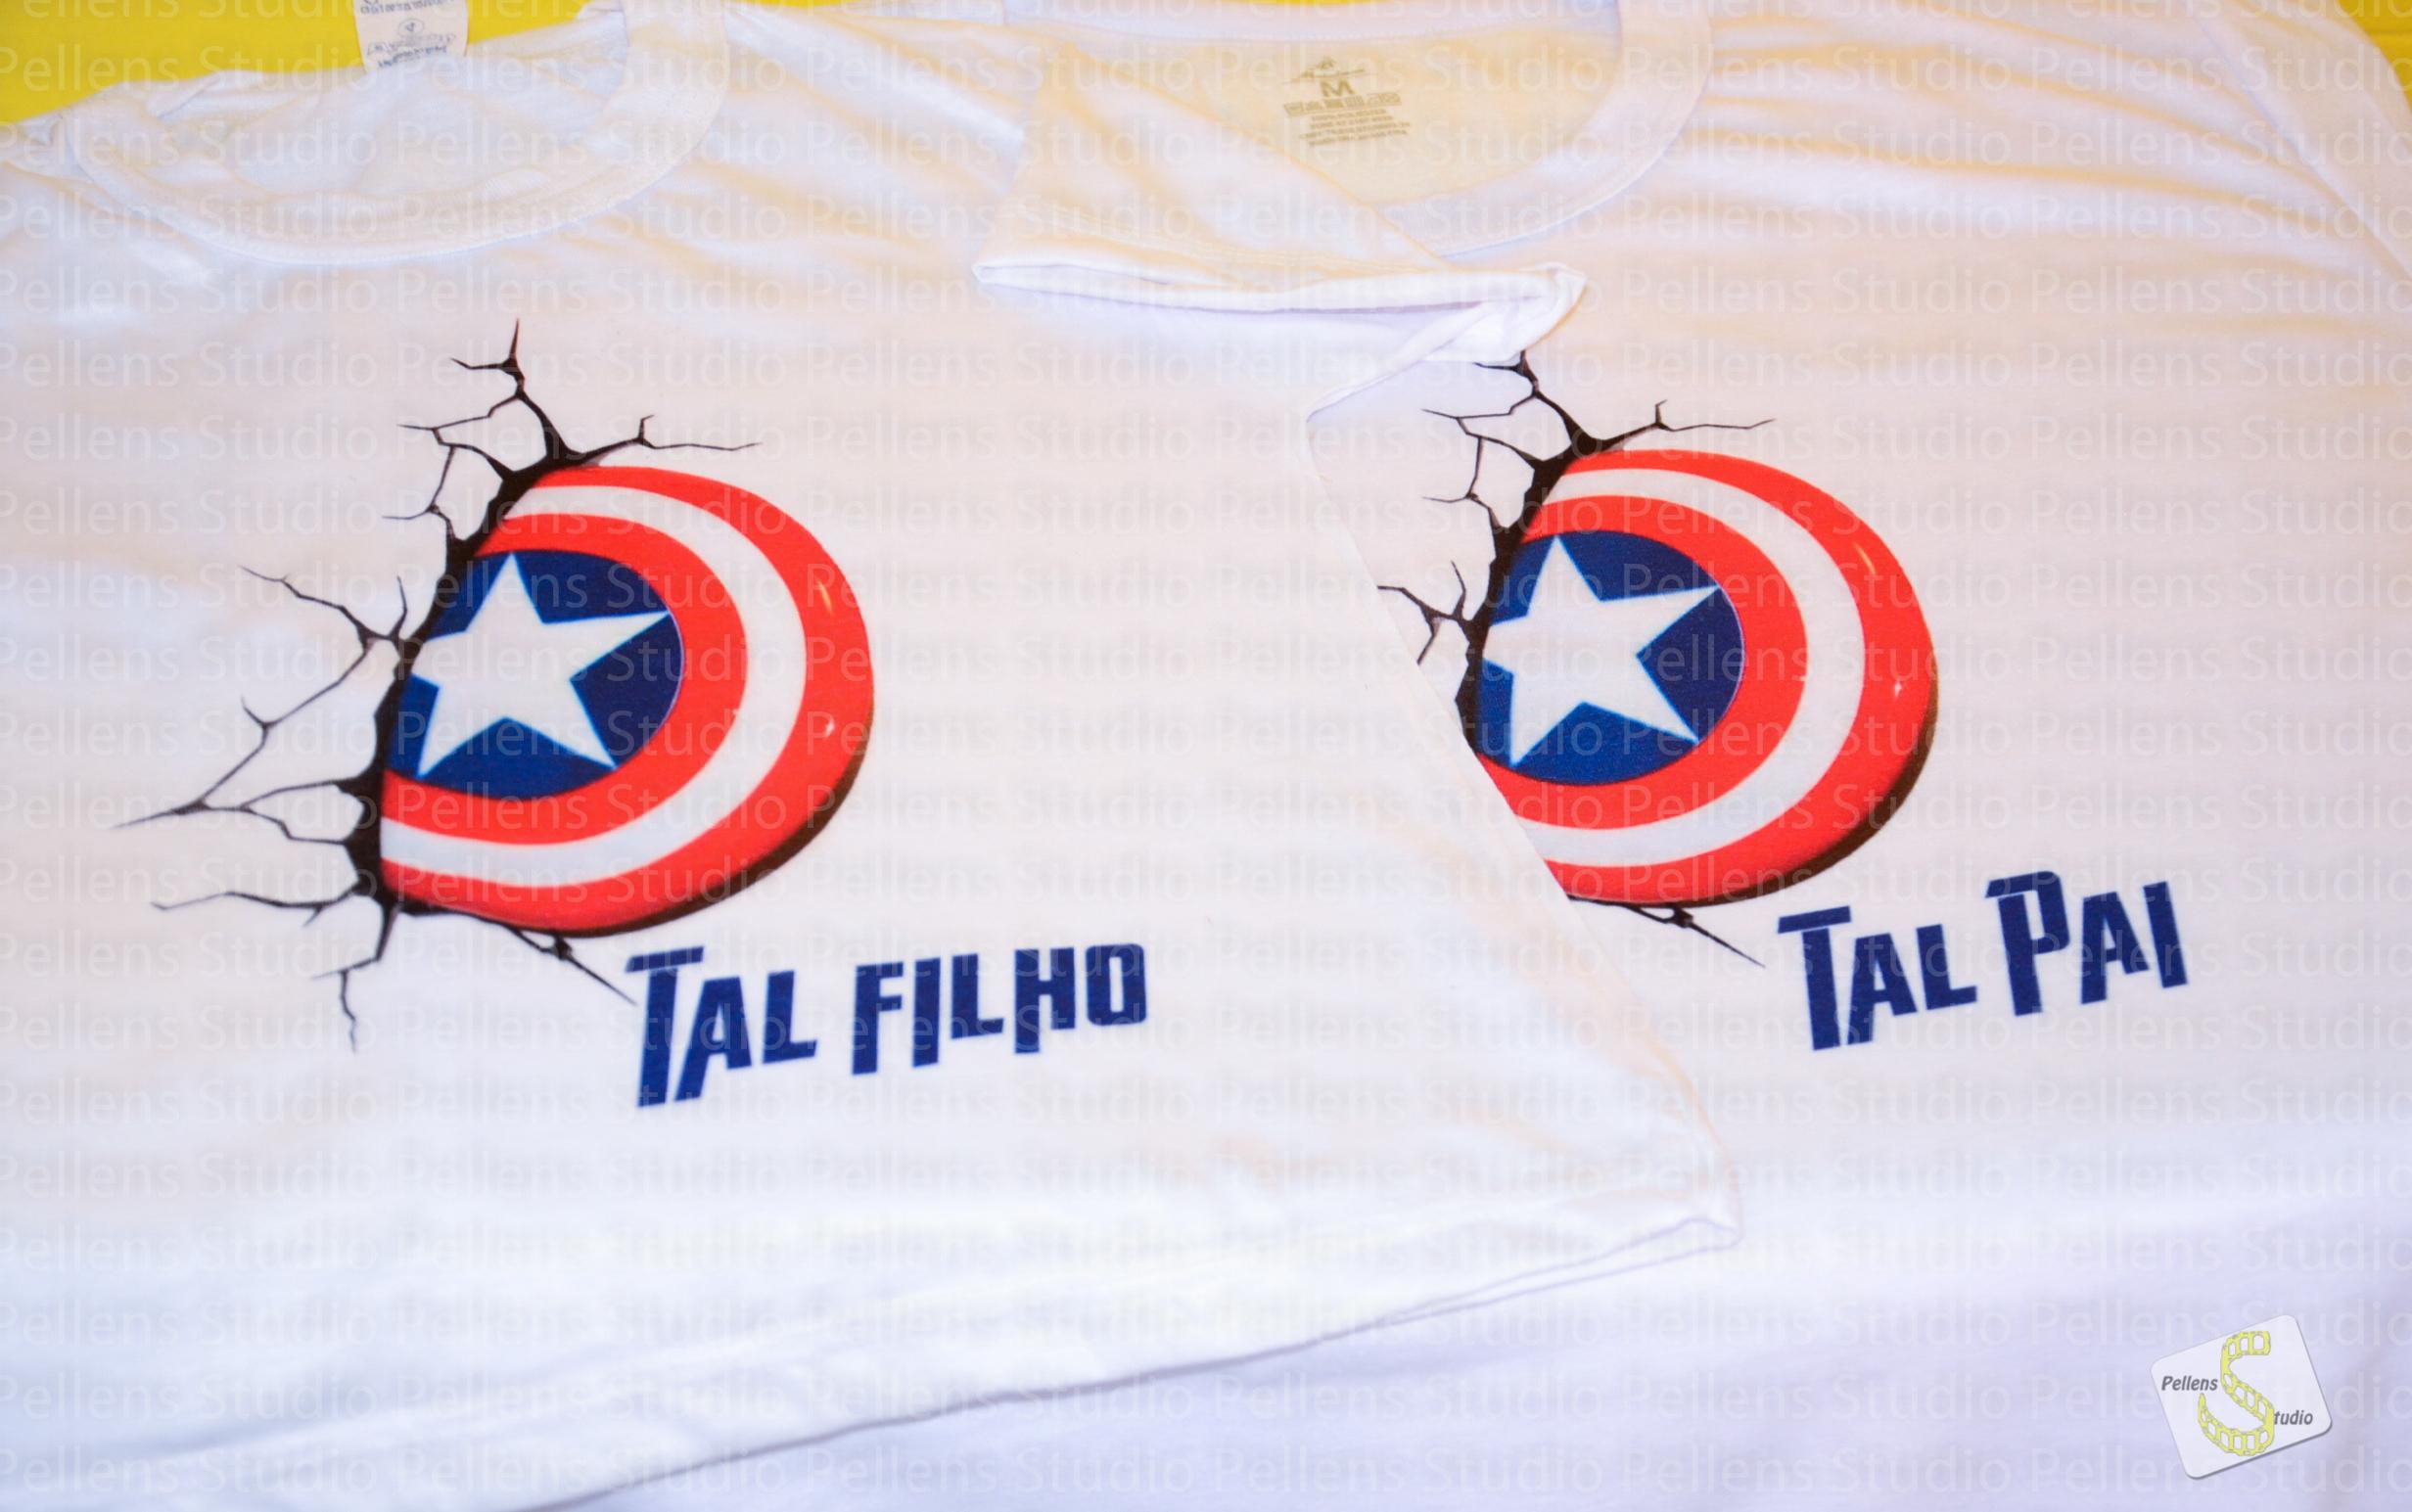 54289dcce4b4ff Camiseta Tal Pai Tal Filho Capitão Améri